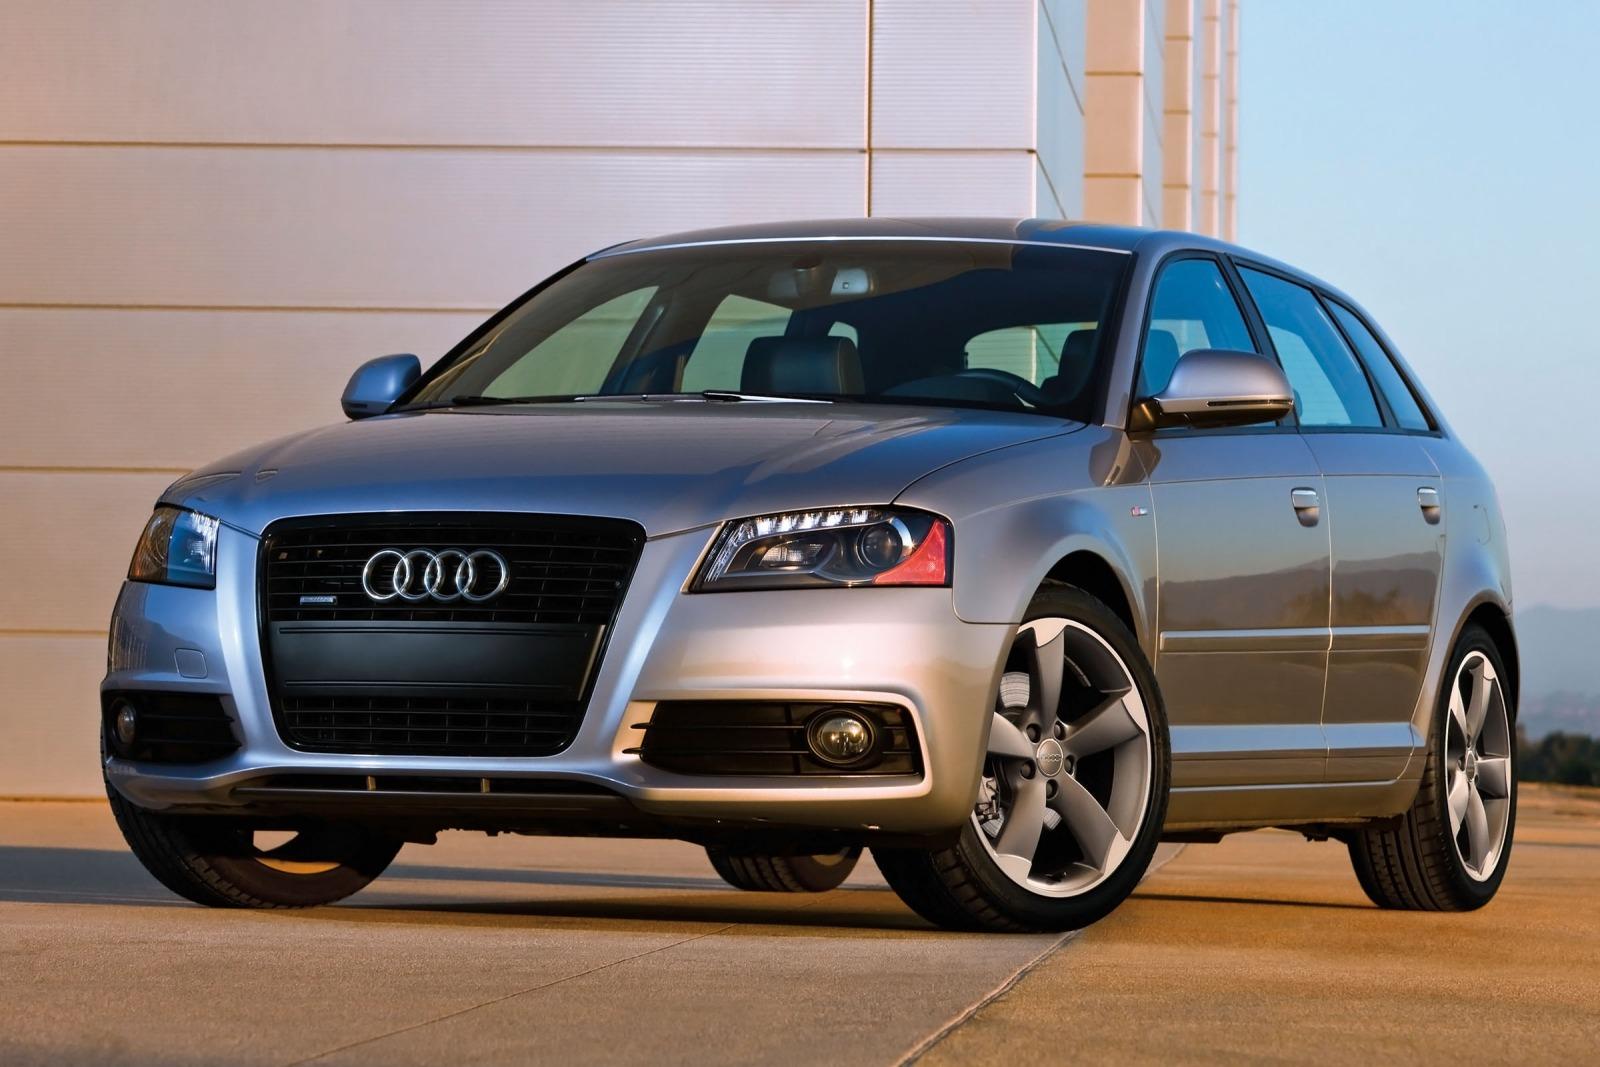 2012 Audi A3 Image 2